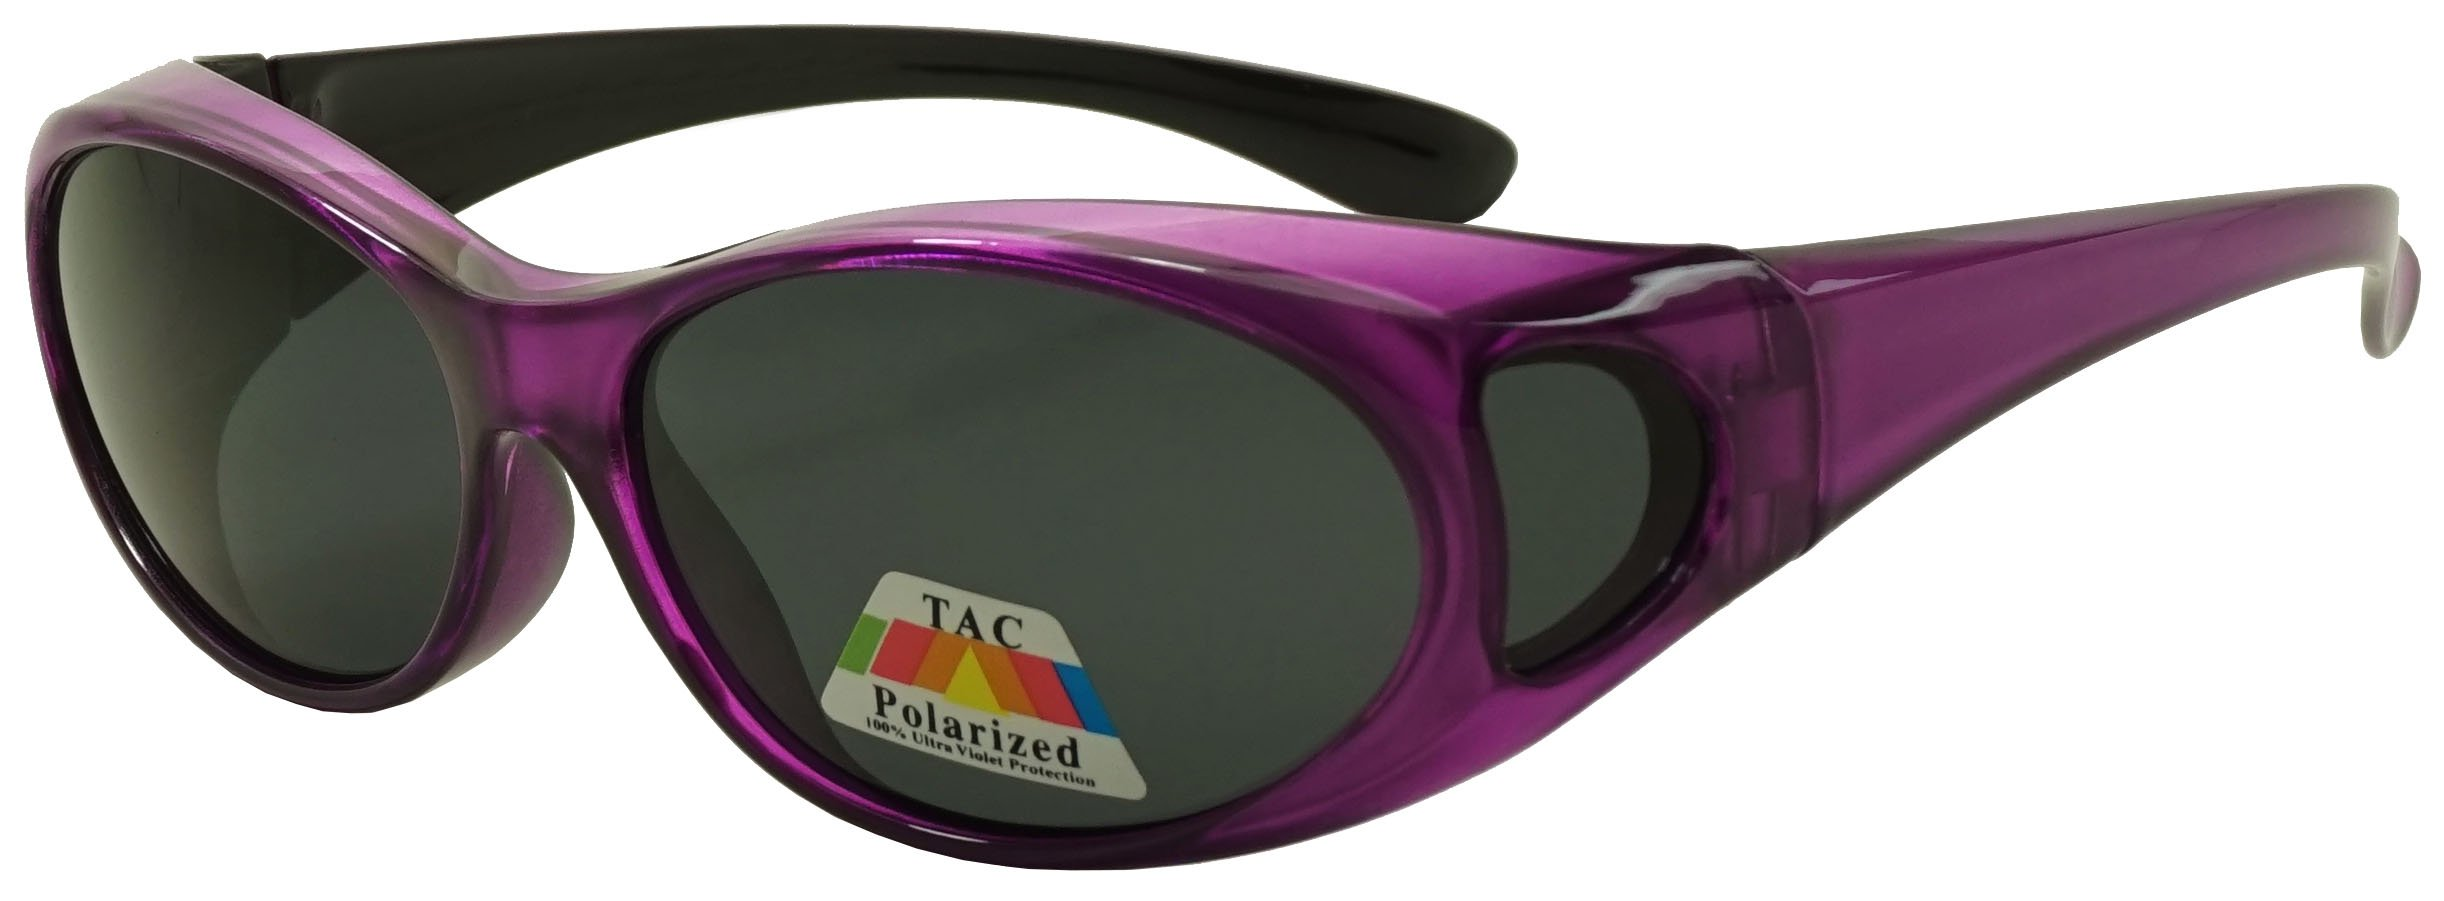 Fit Over Wrap Sunglasses w/ Super Dark Polarized Lens - Size Medium Wear Over (Purple, Black)